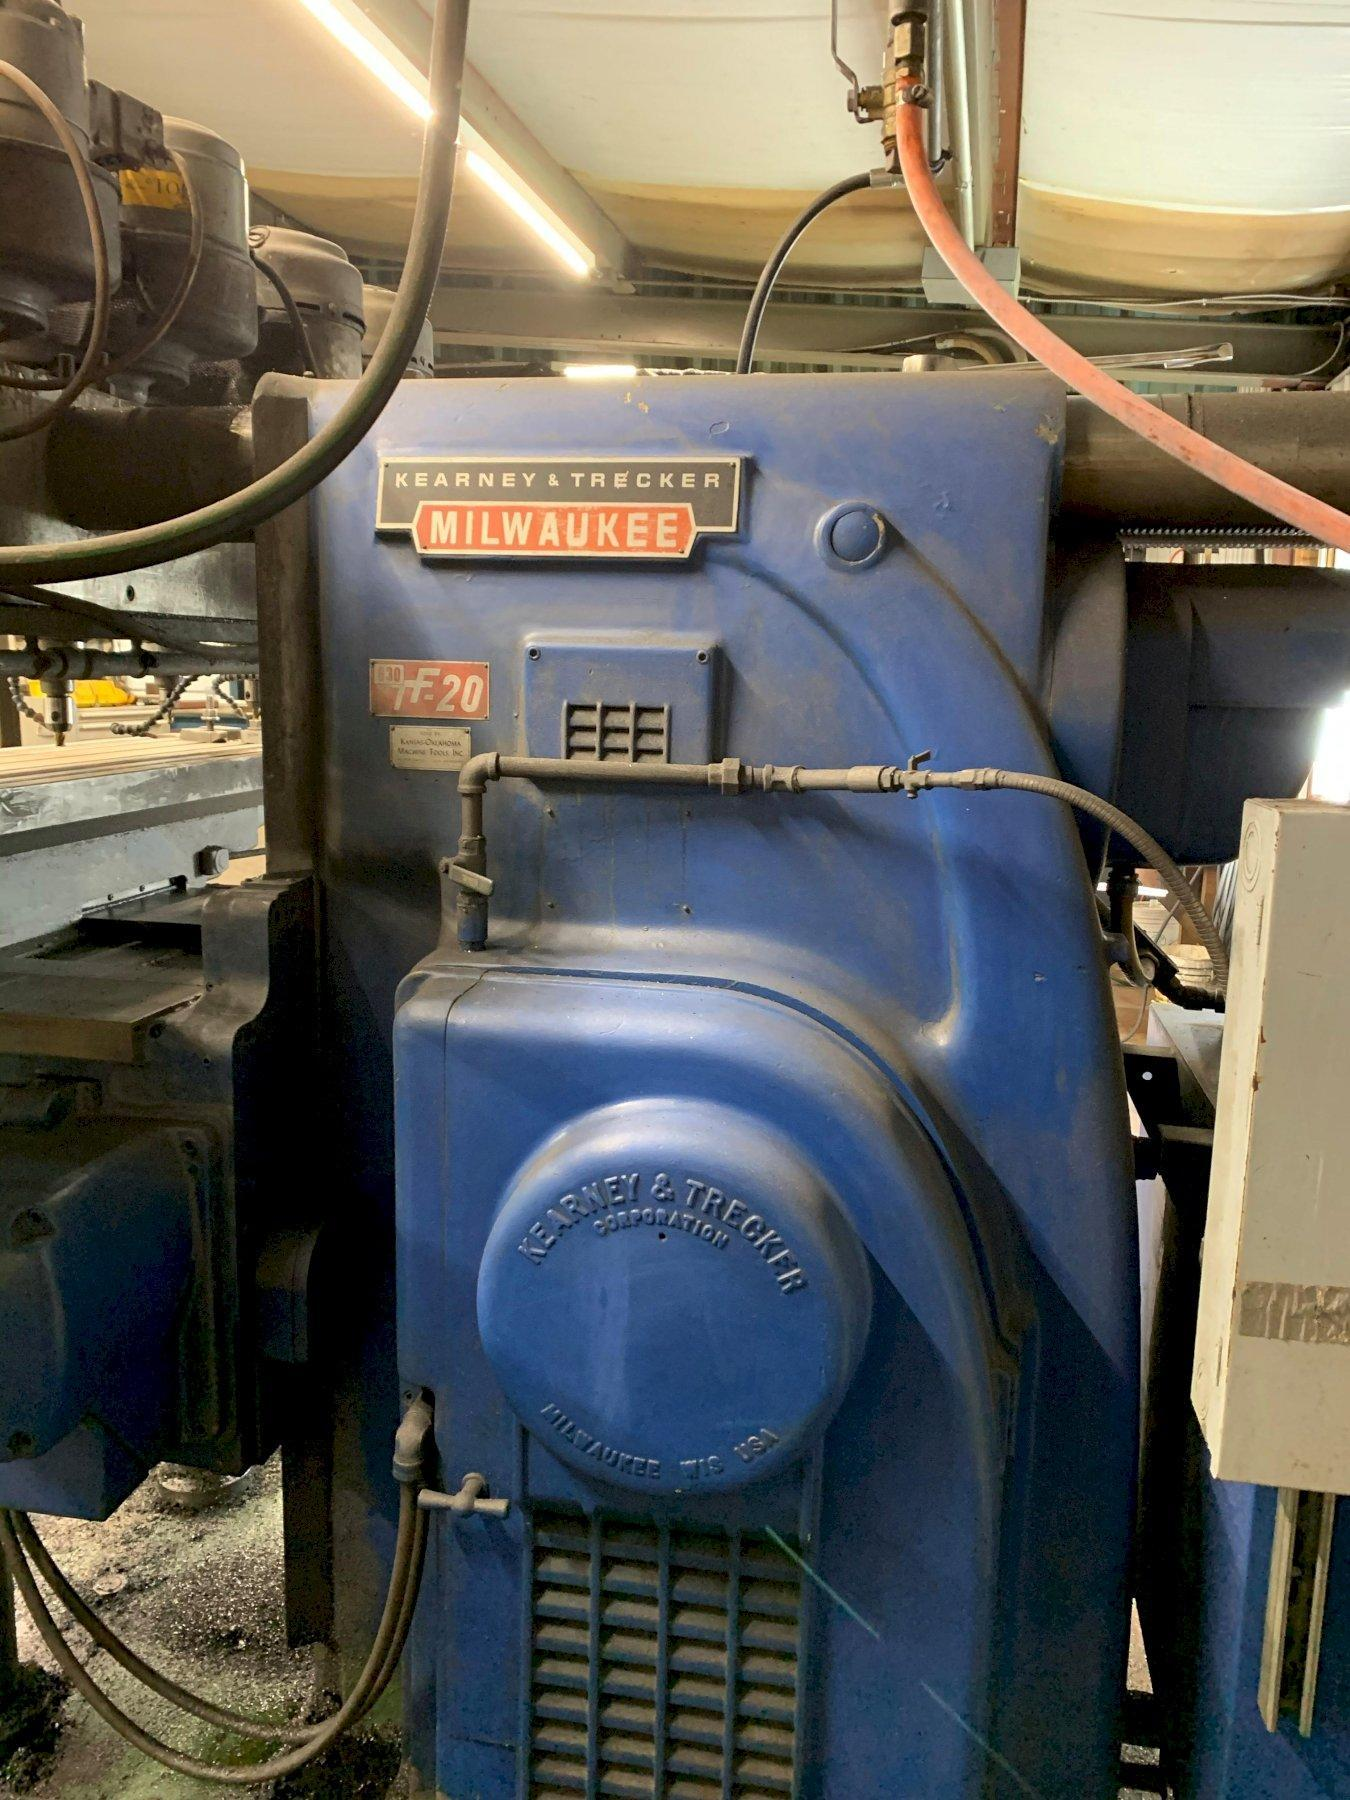 KEARNEY & TRECKER 630TF-20 HORIZONTAL MILLING MACHINE. STOCK # 0952320